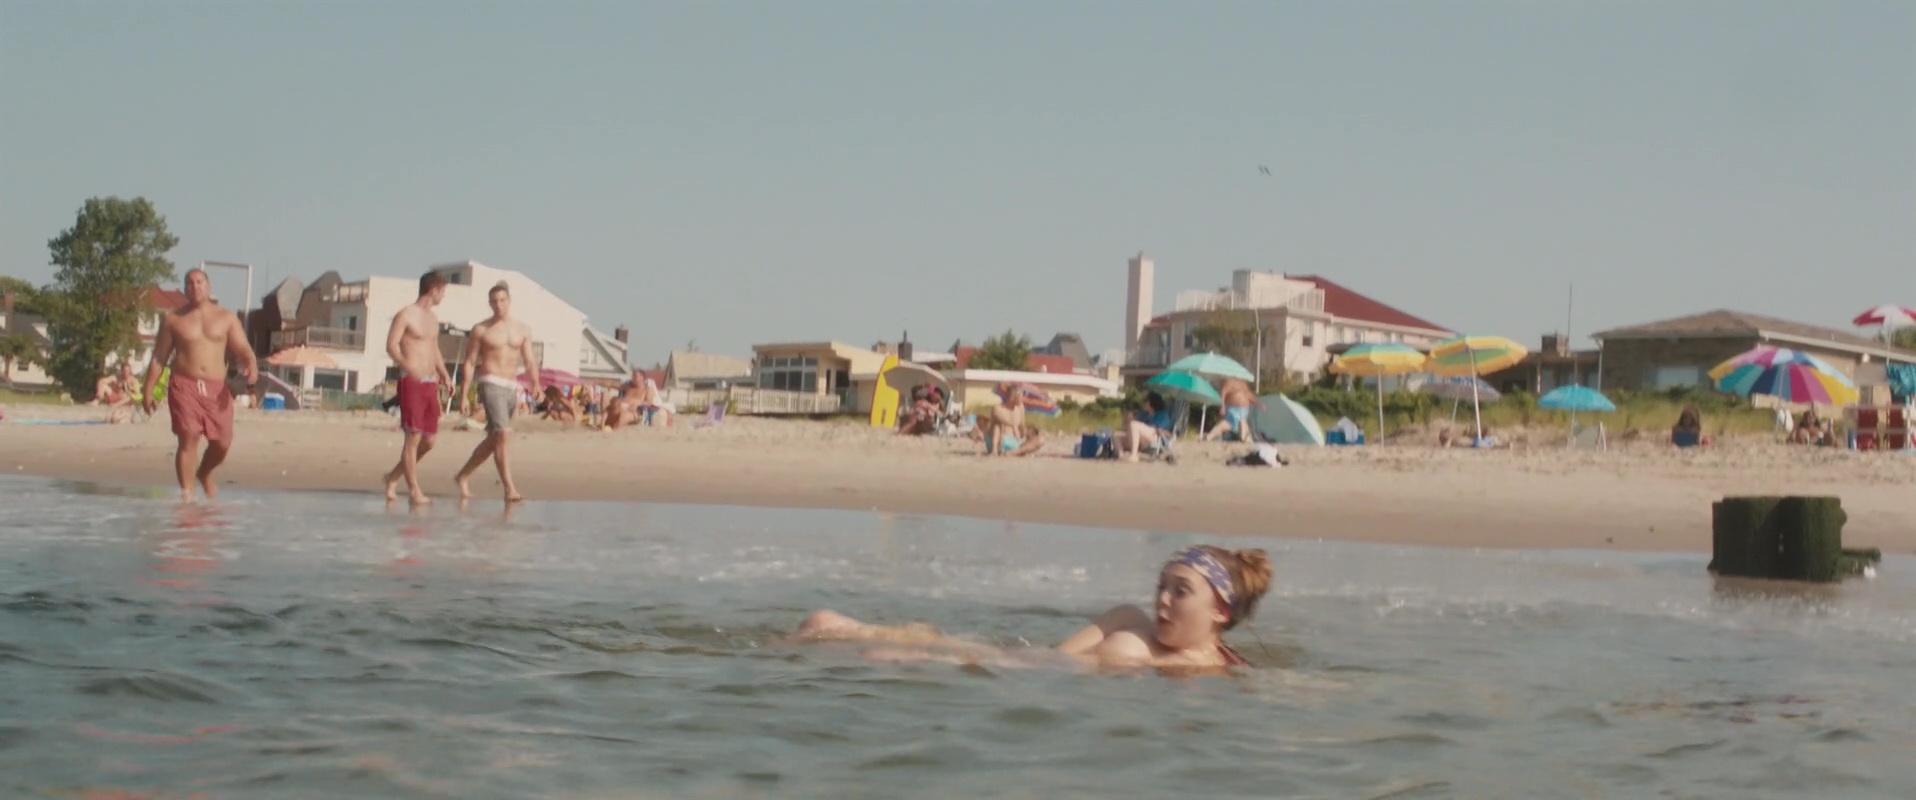 Hot Girl At Nude Beach